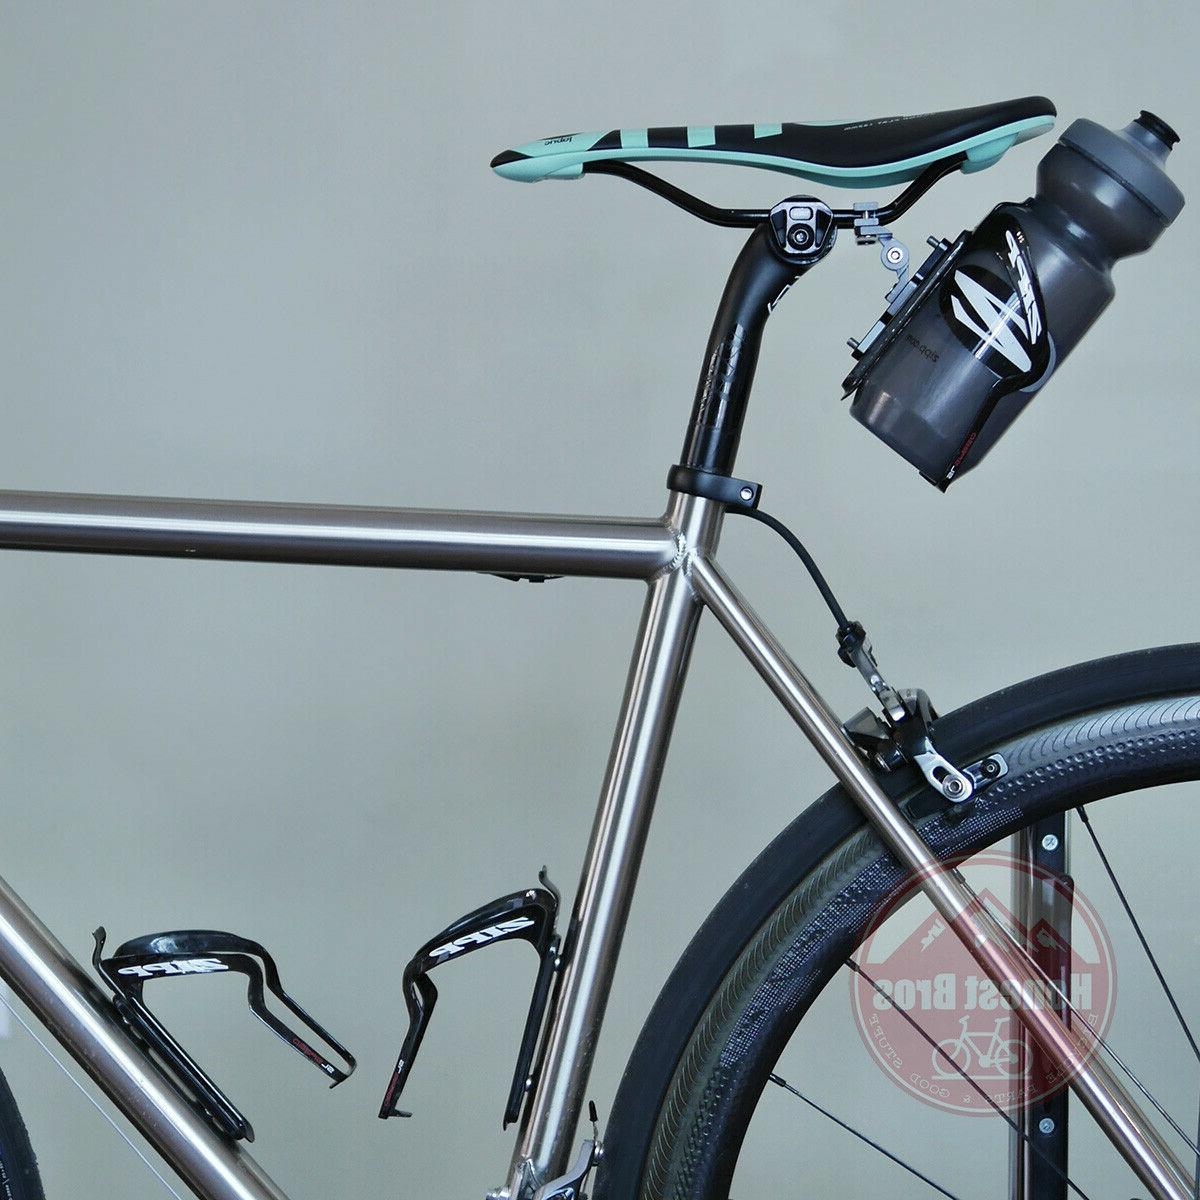 Saddle Mount Water Bottle Cage Holder Bicycle